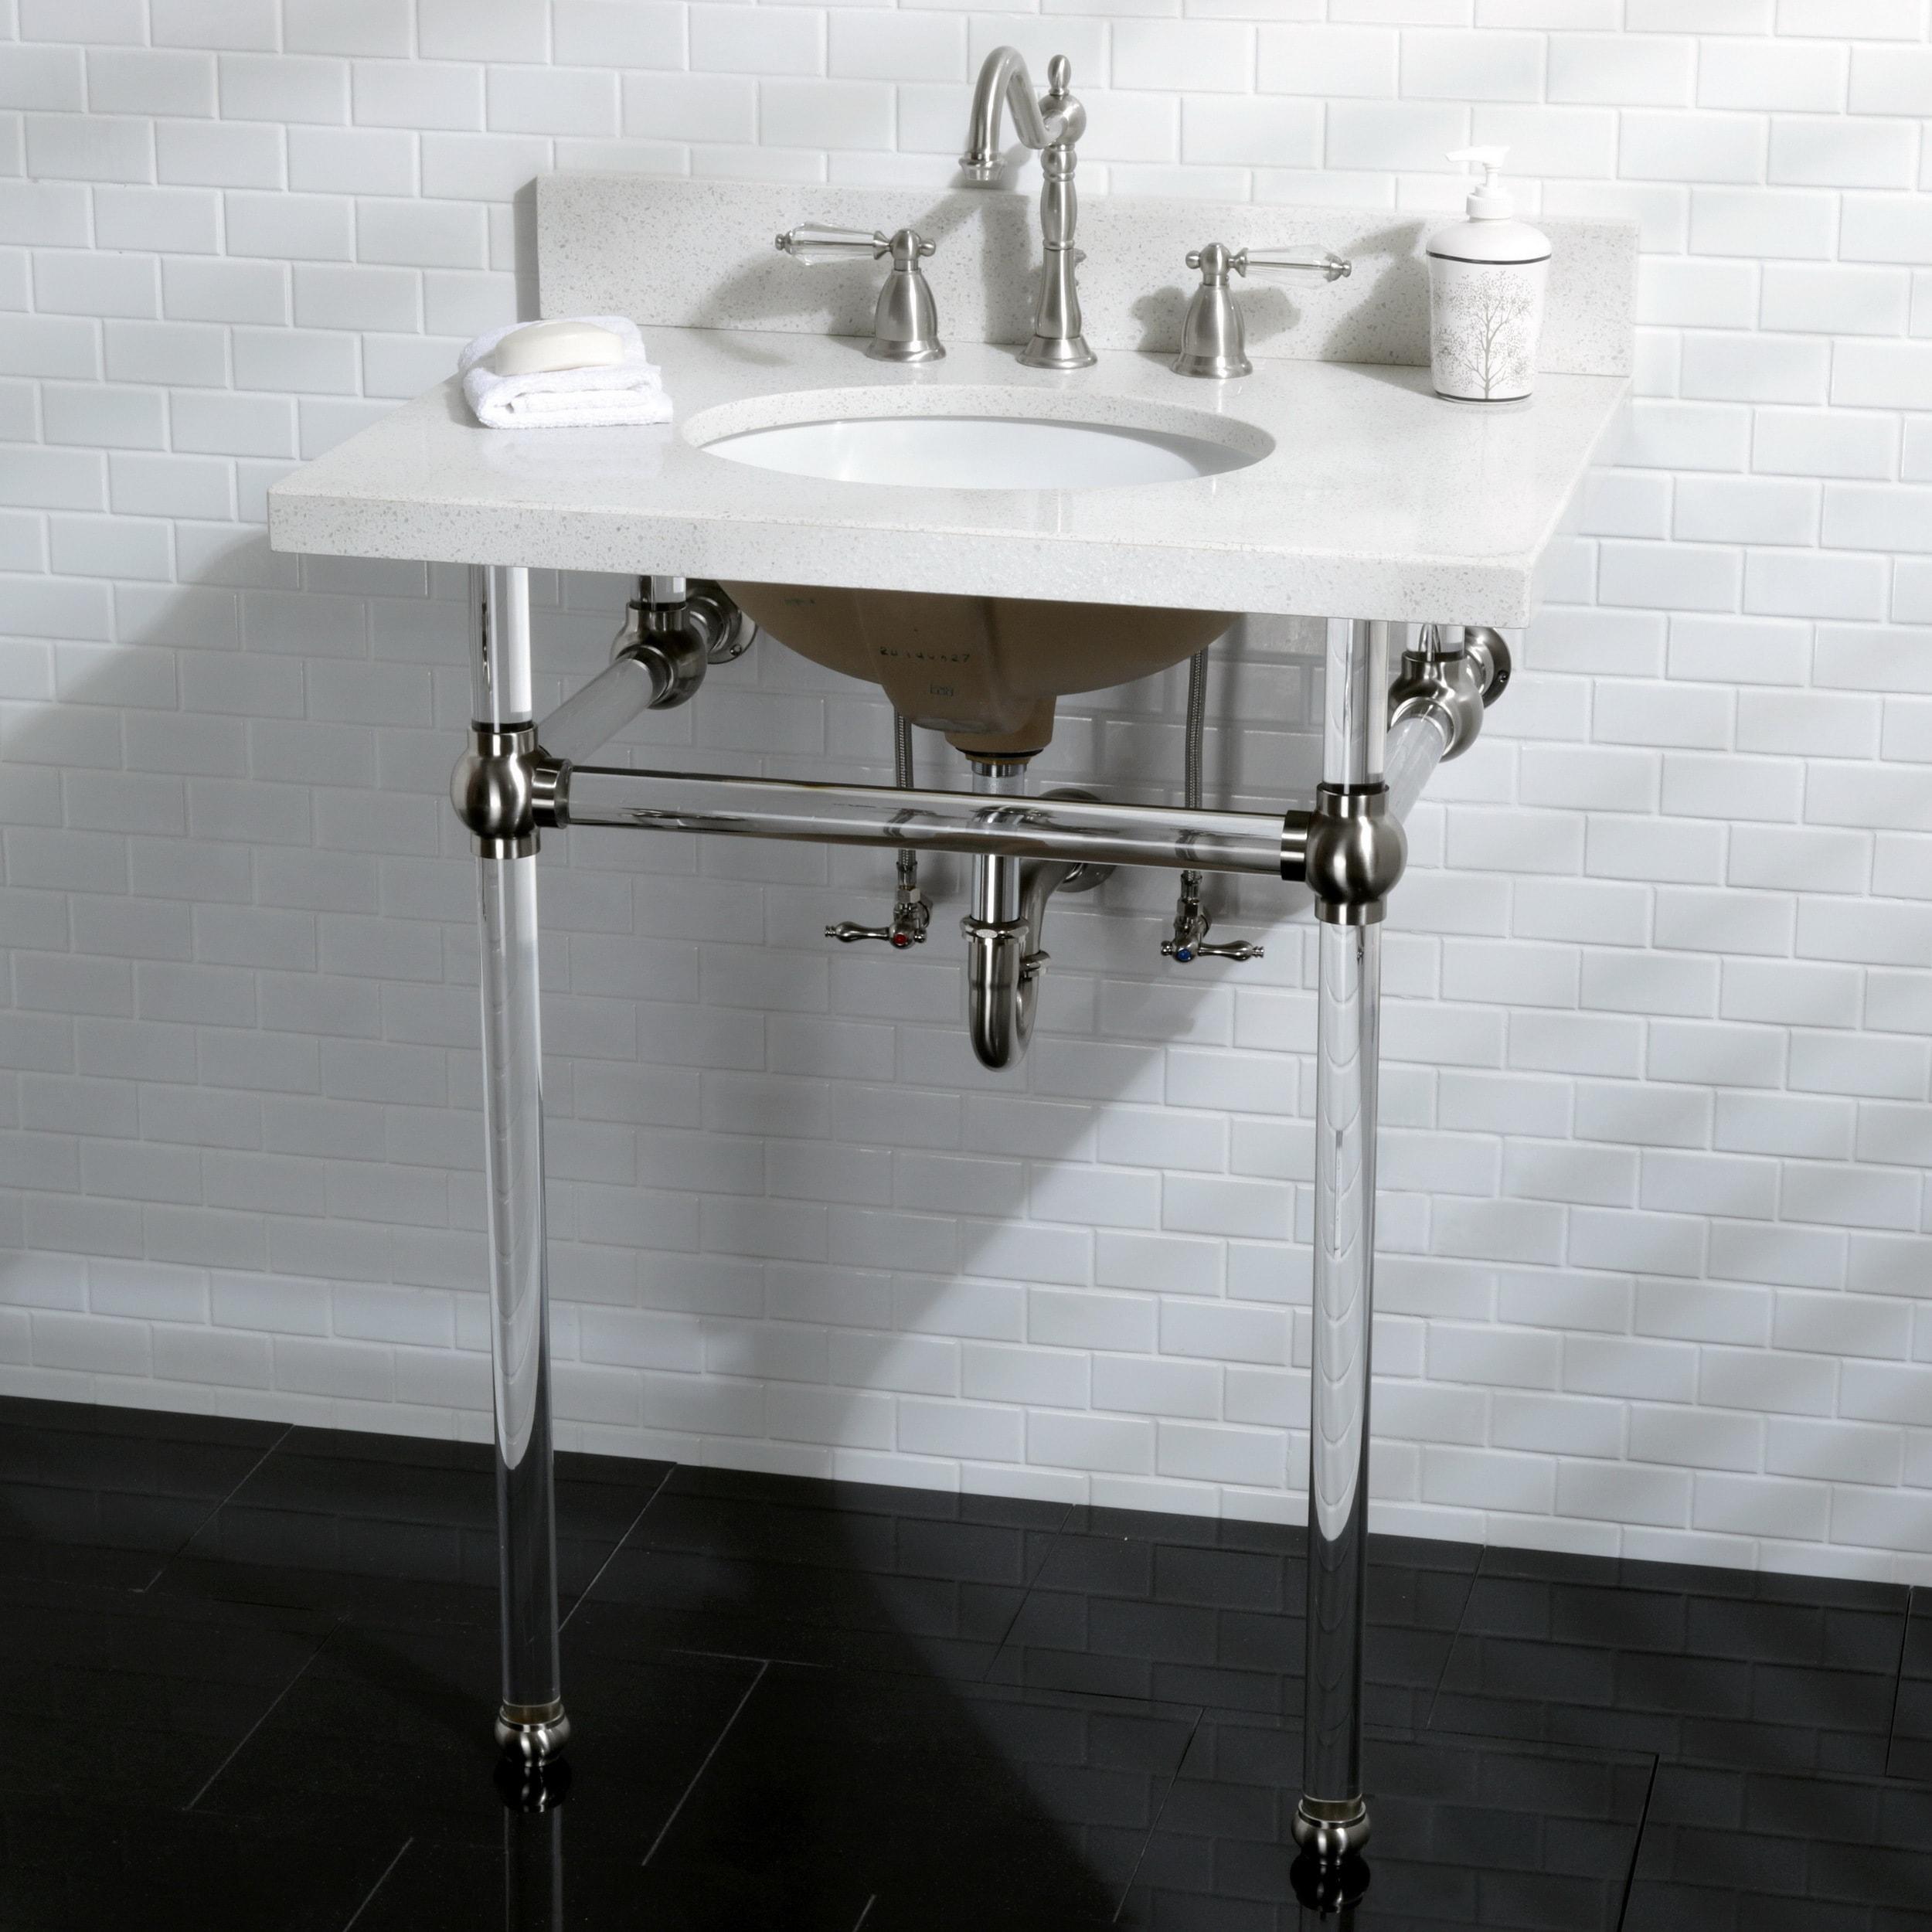 White Quartz 30 Inch Wall Mount Pedestal Bathroom Sink Vanity With